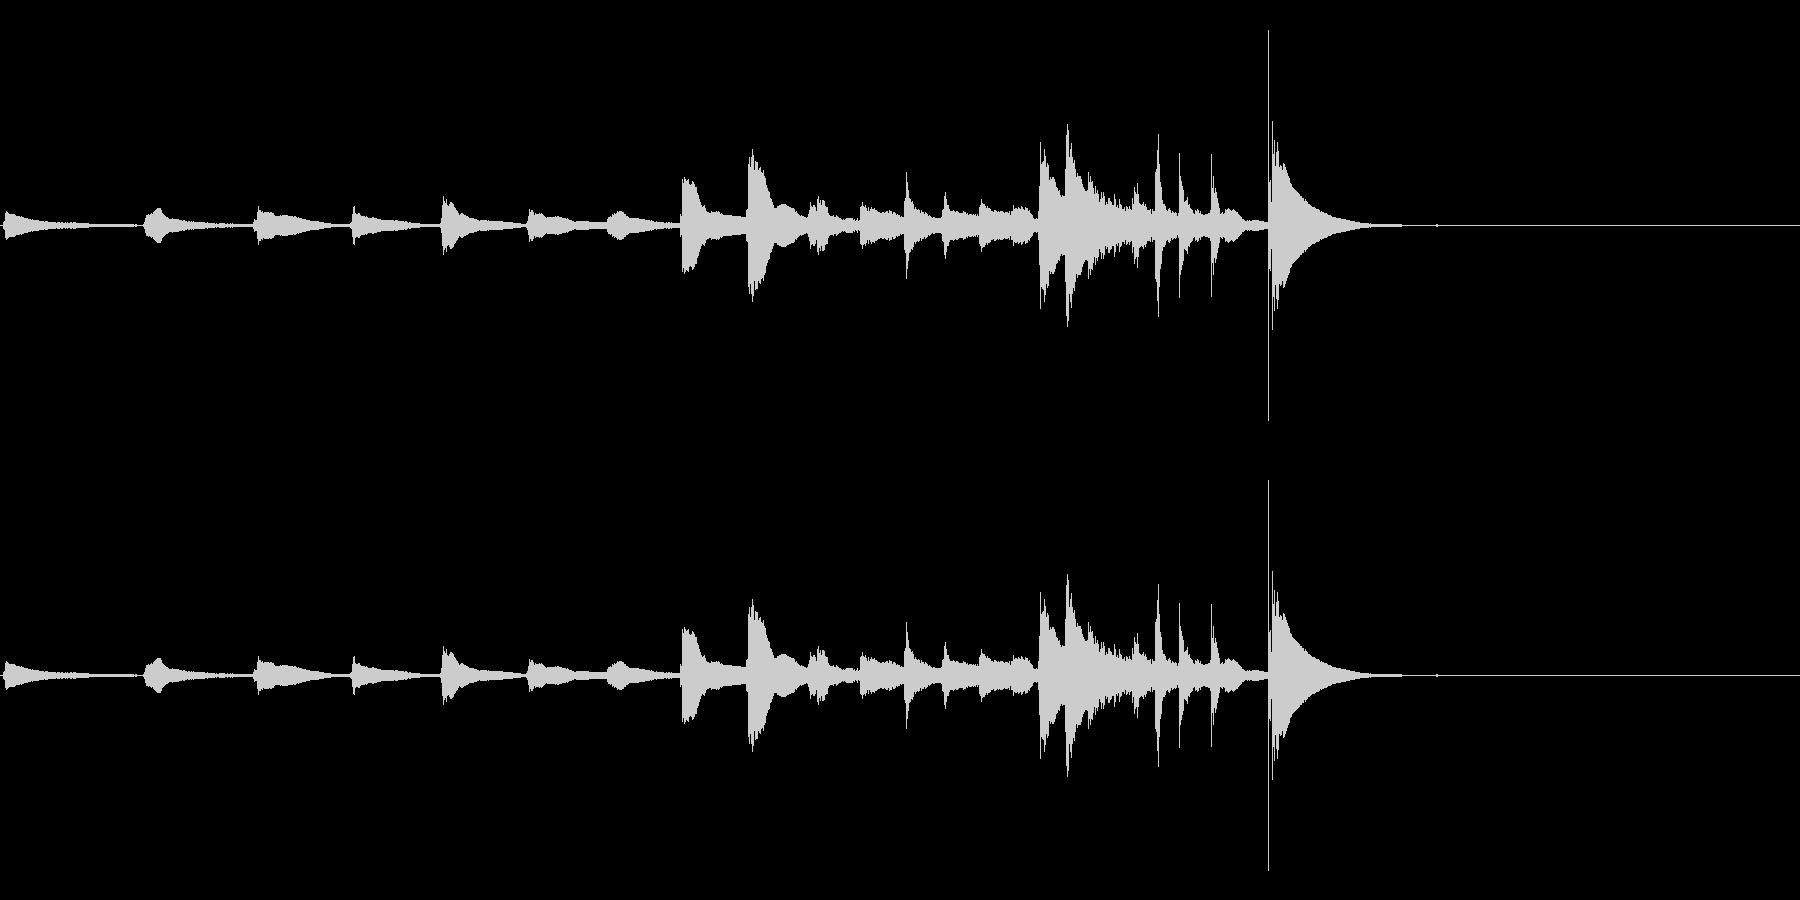 生演奏 琵琶 武士 和風 古典風#16の未再生の波形